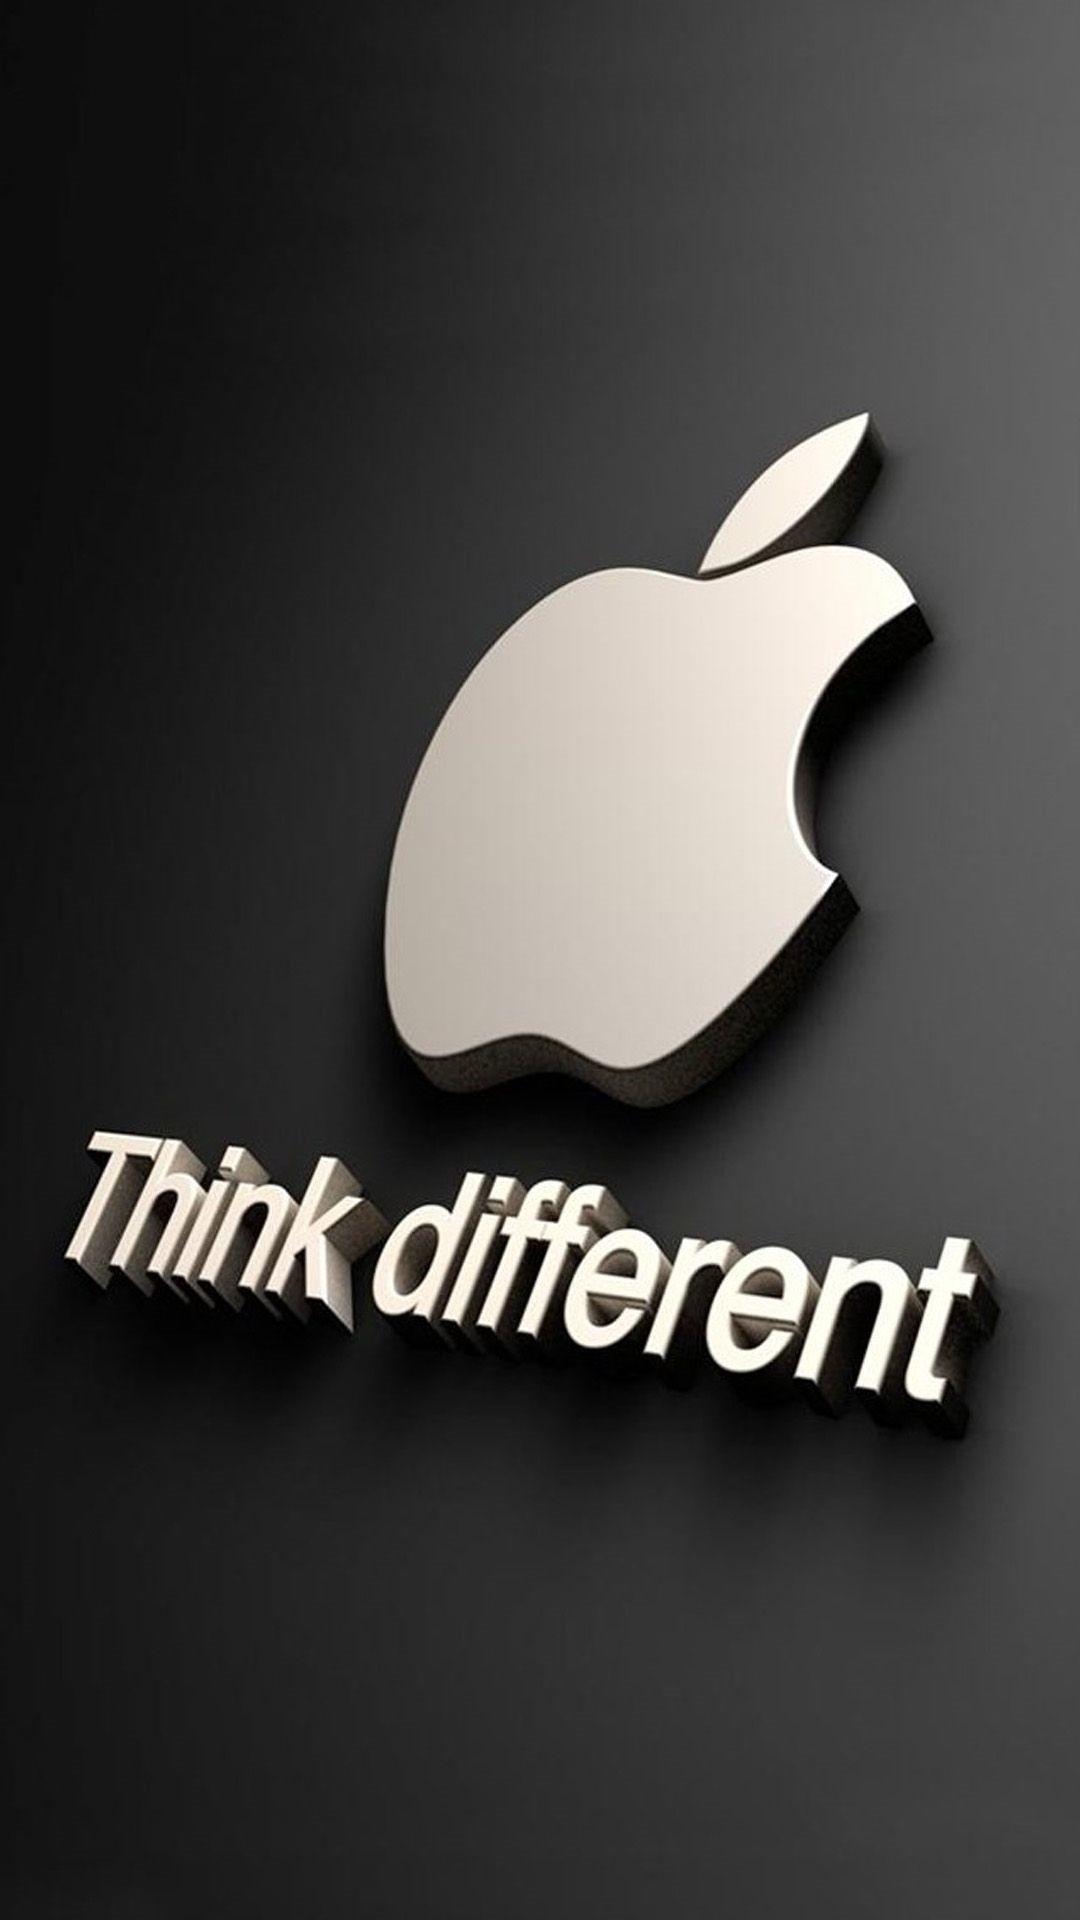 Logo phone wallpaper